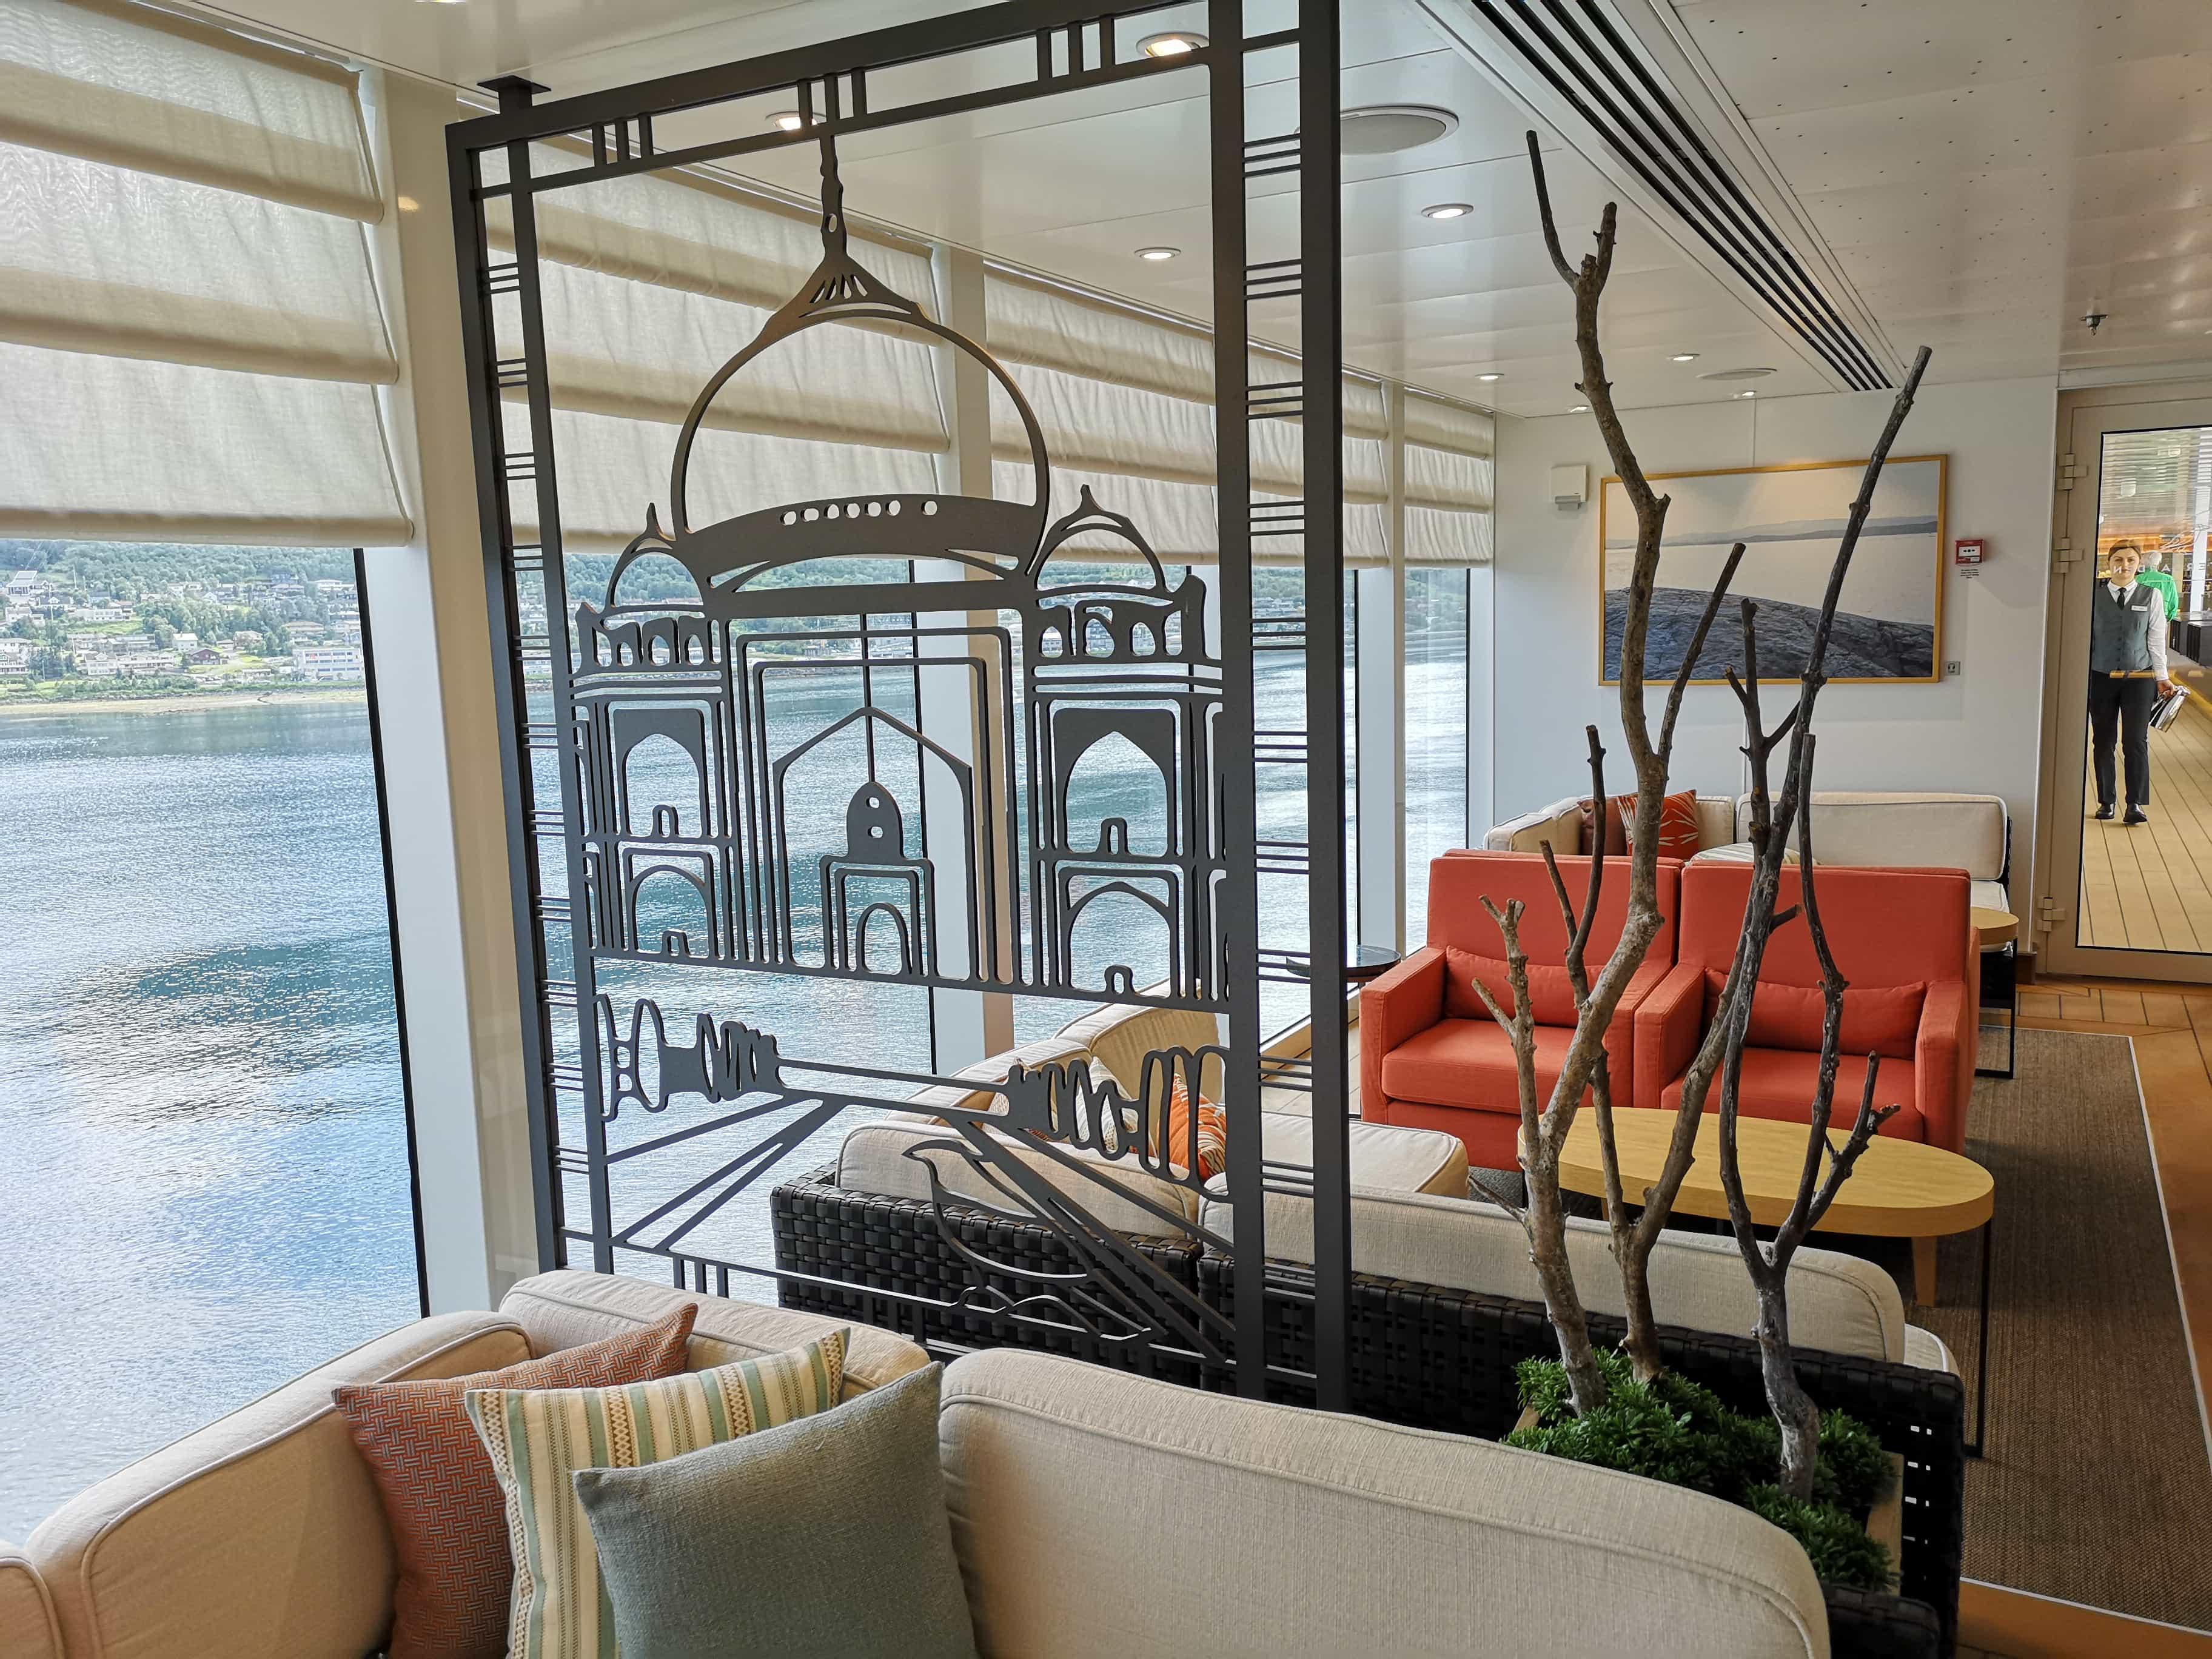 Viking Sea - Lanai Cushions Sofas Interior Design